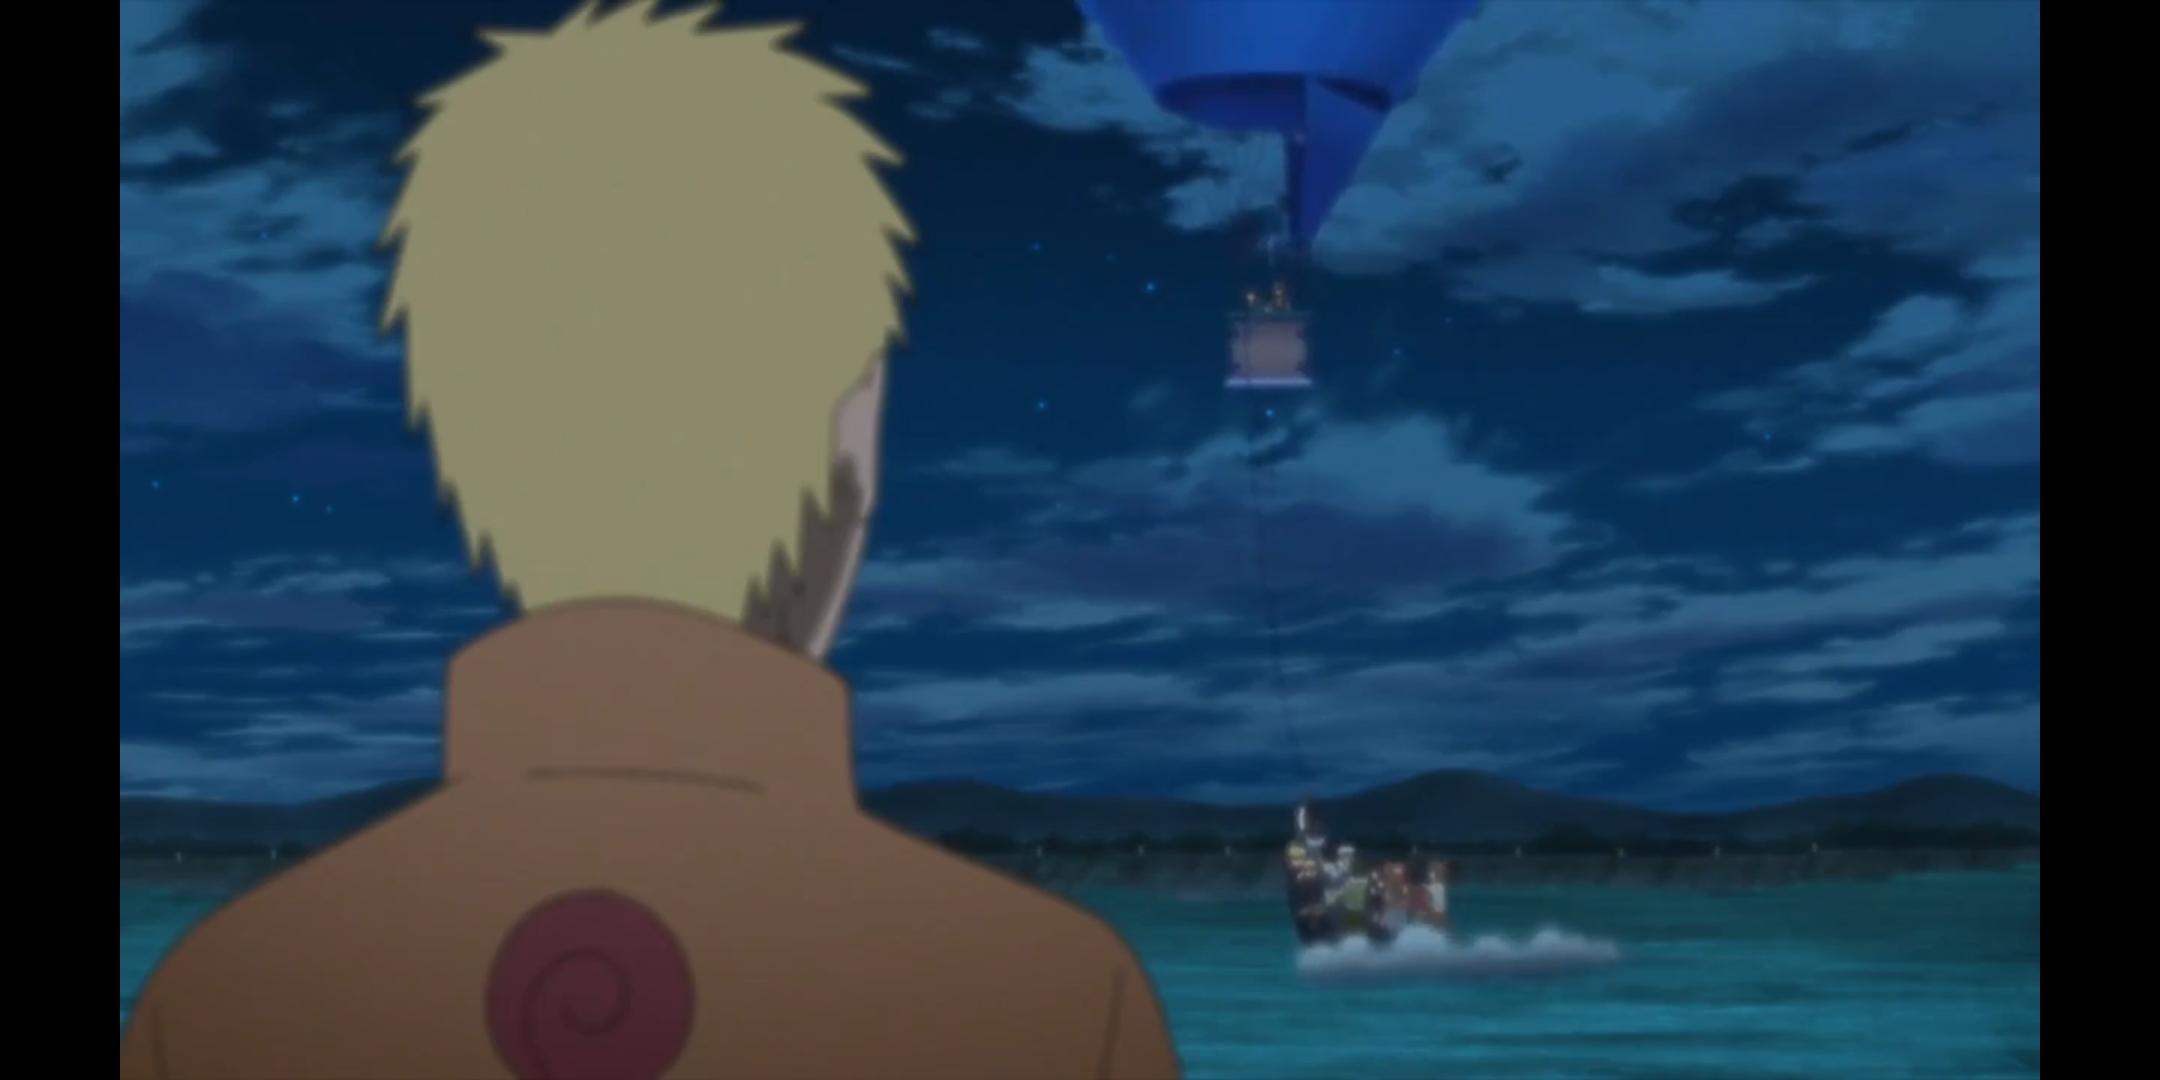 Episódio 176 de Boruto - Naruto e Genins